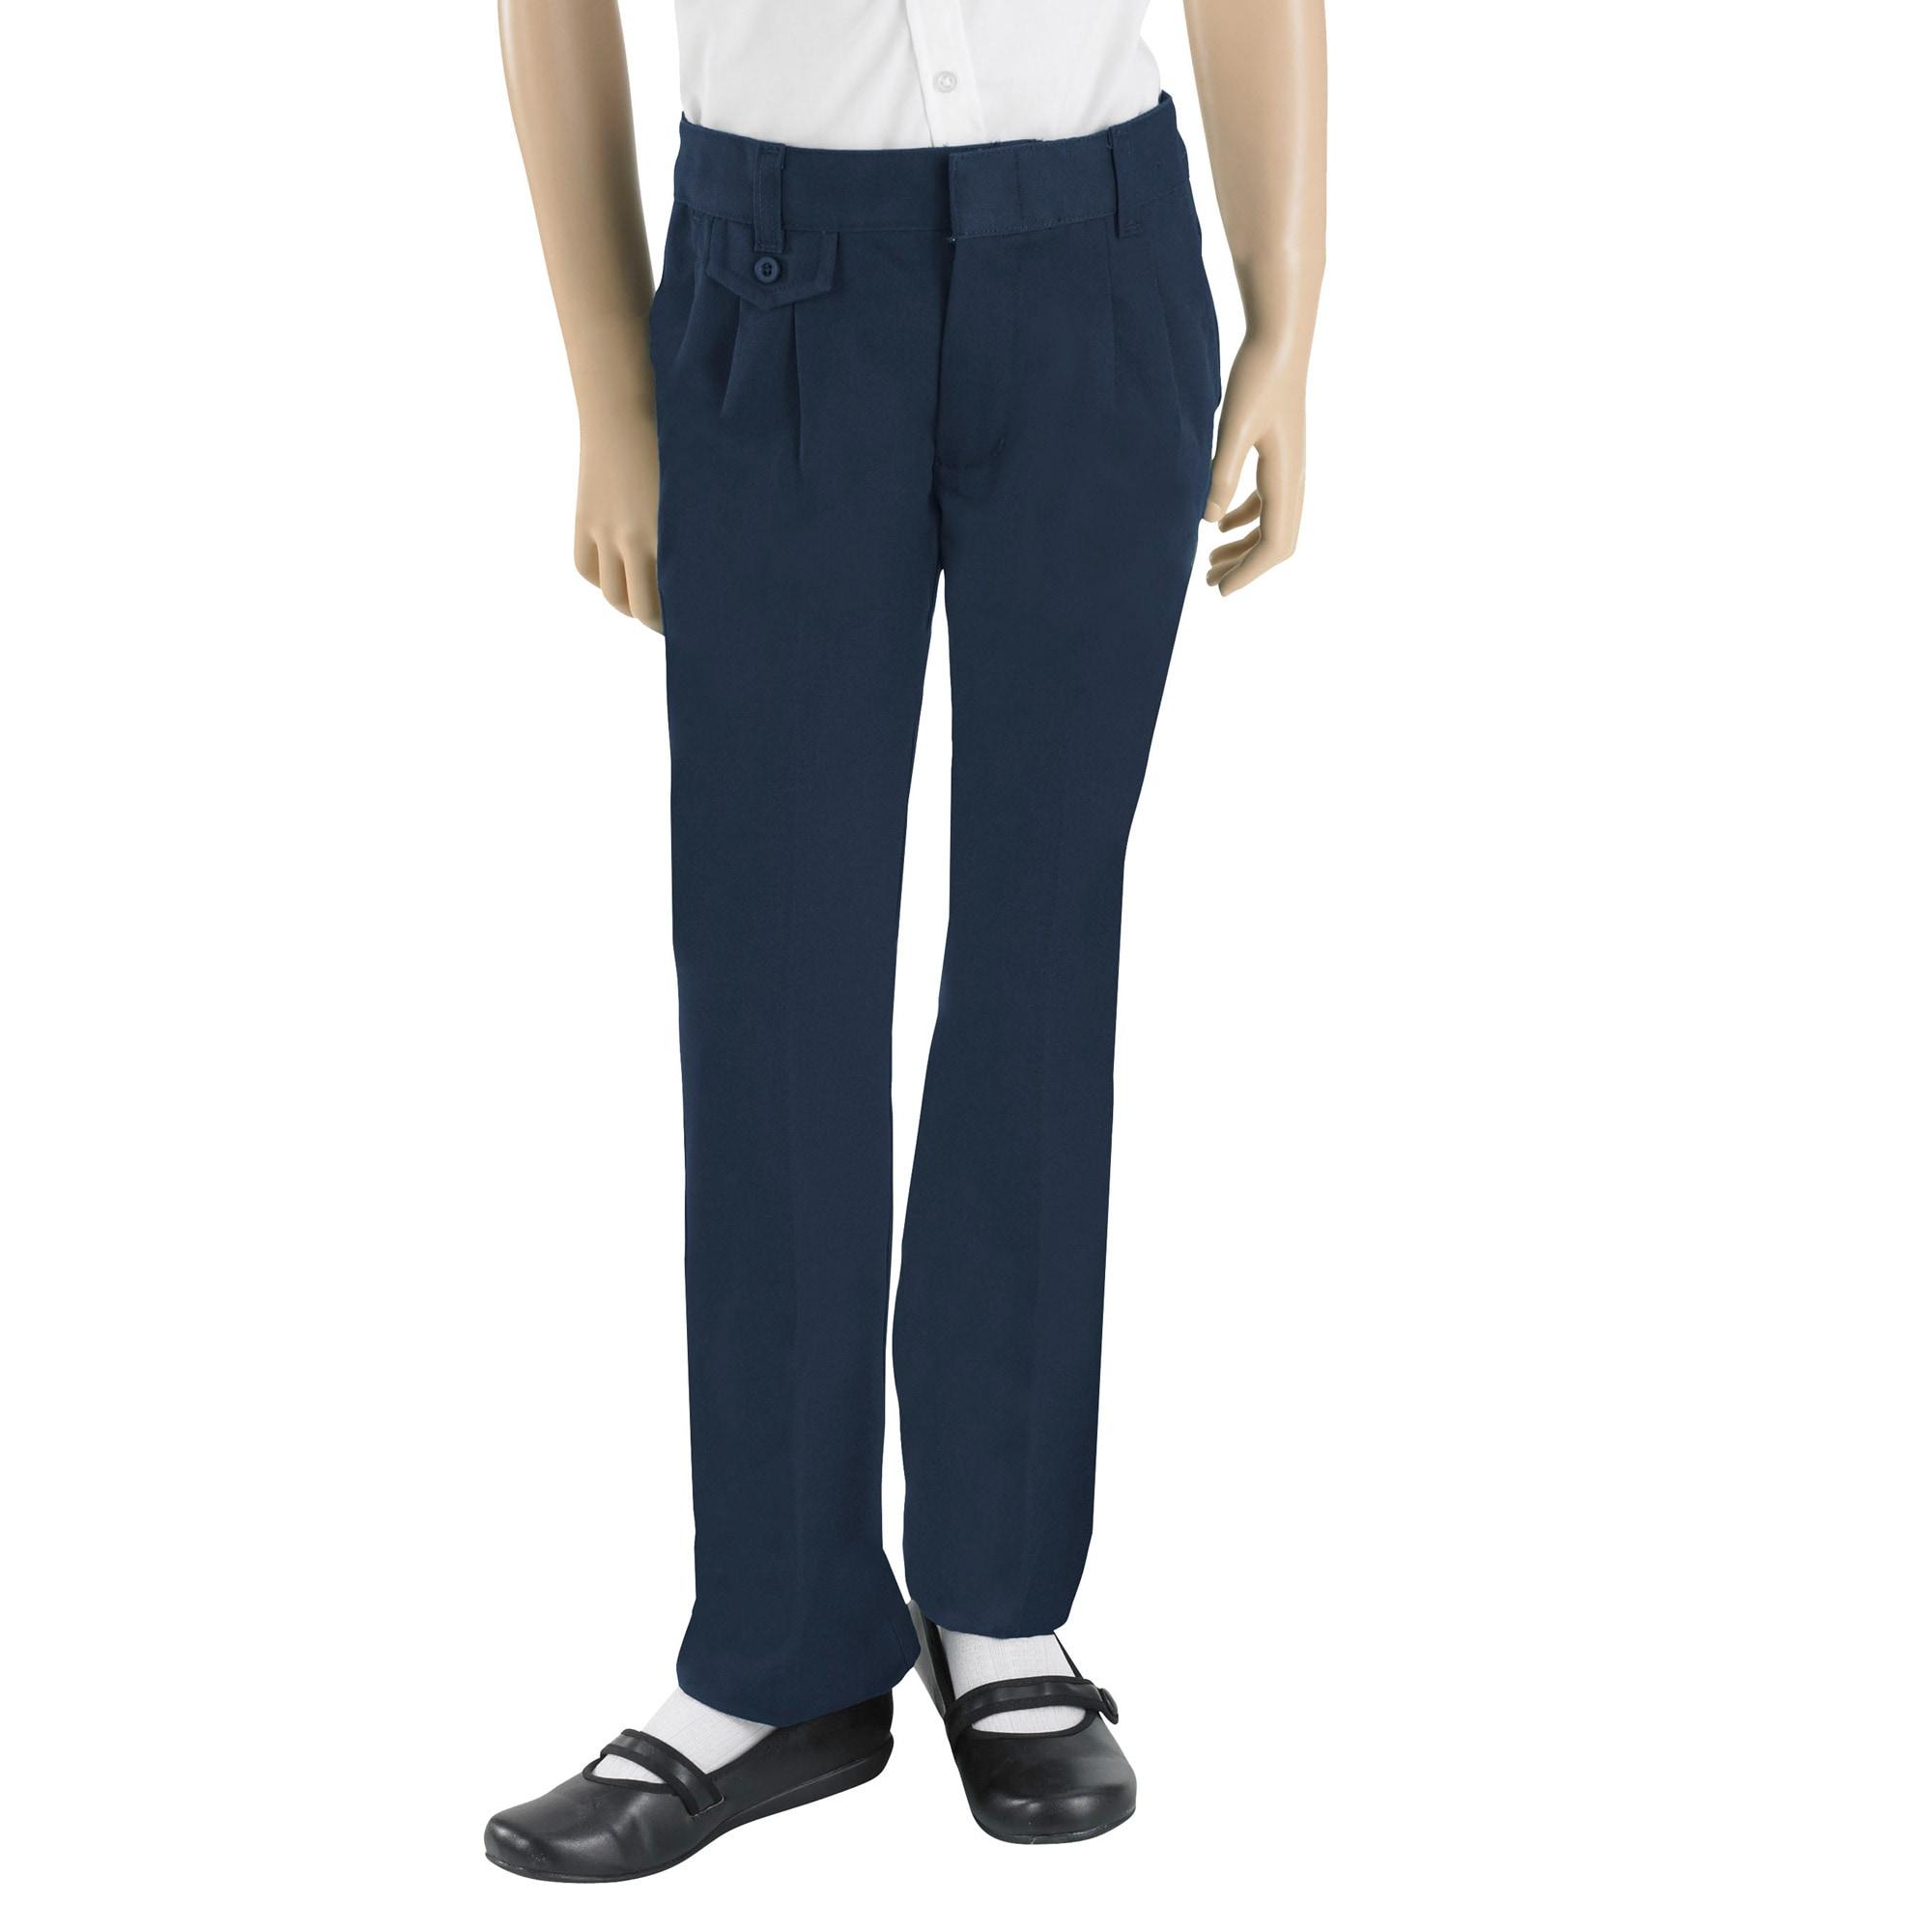 French Toast Girl's School Uniform Navy Twill Pants Size 4 (Set of 2)